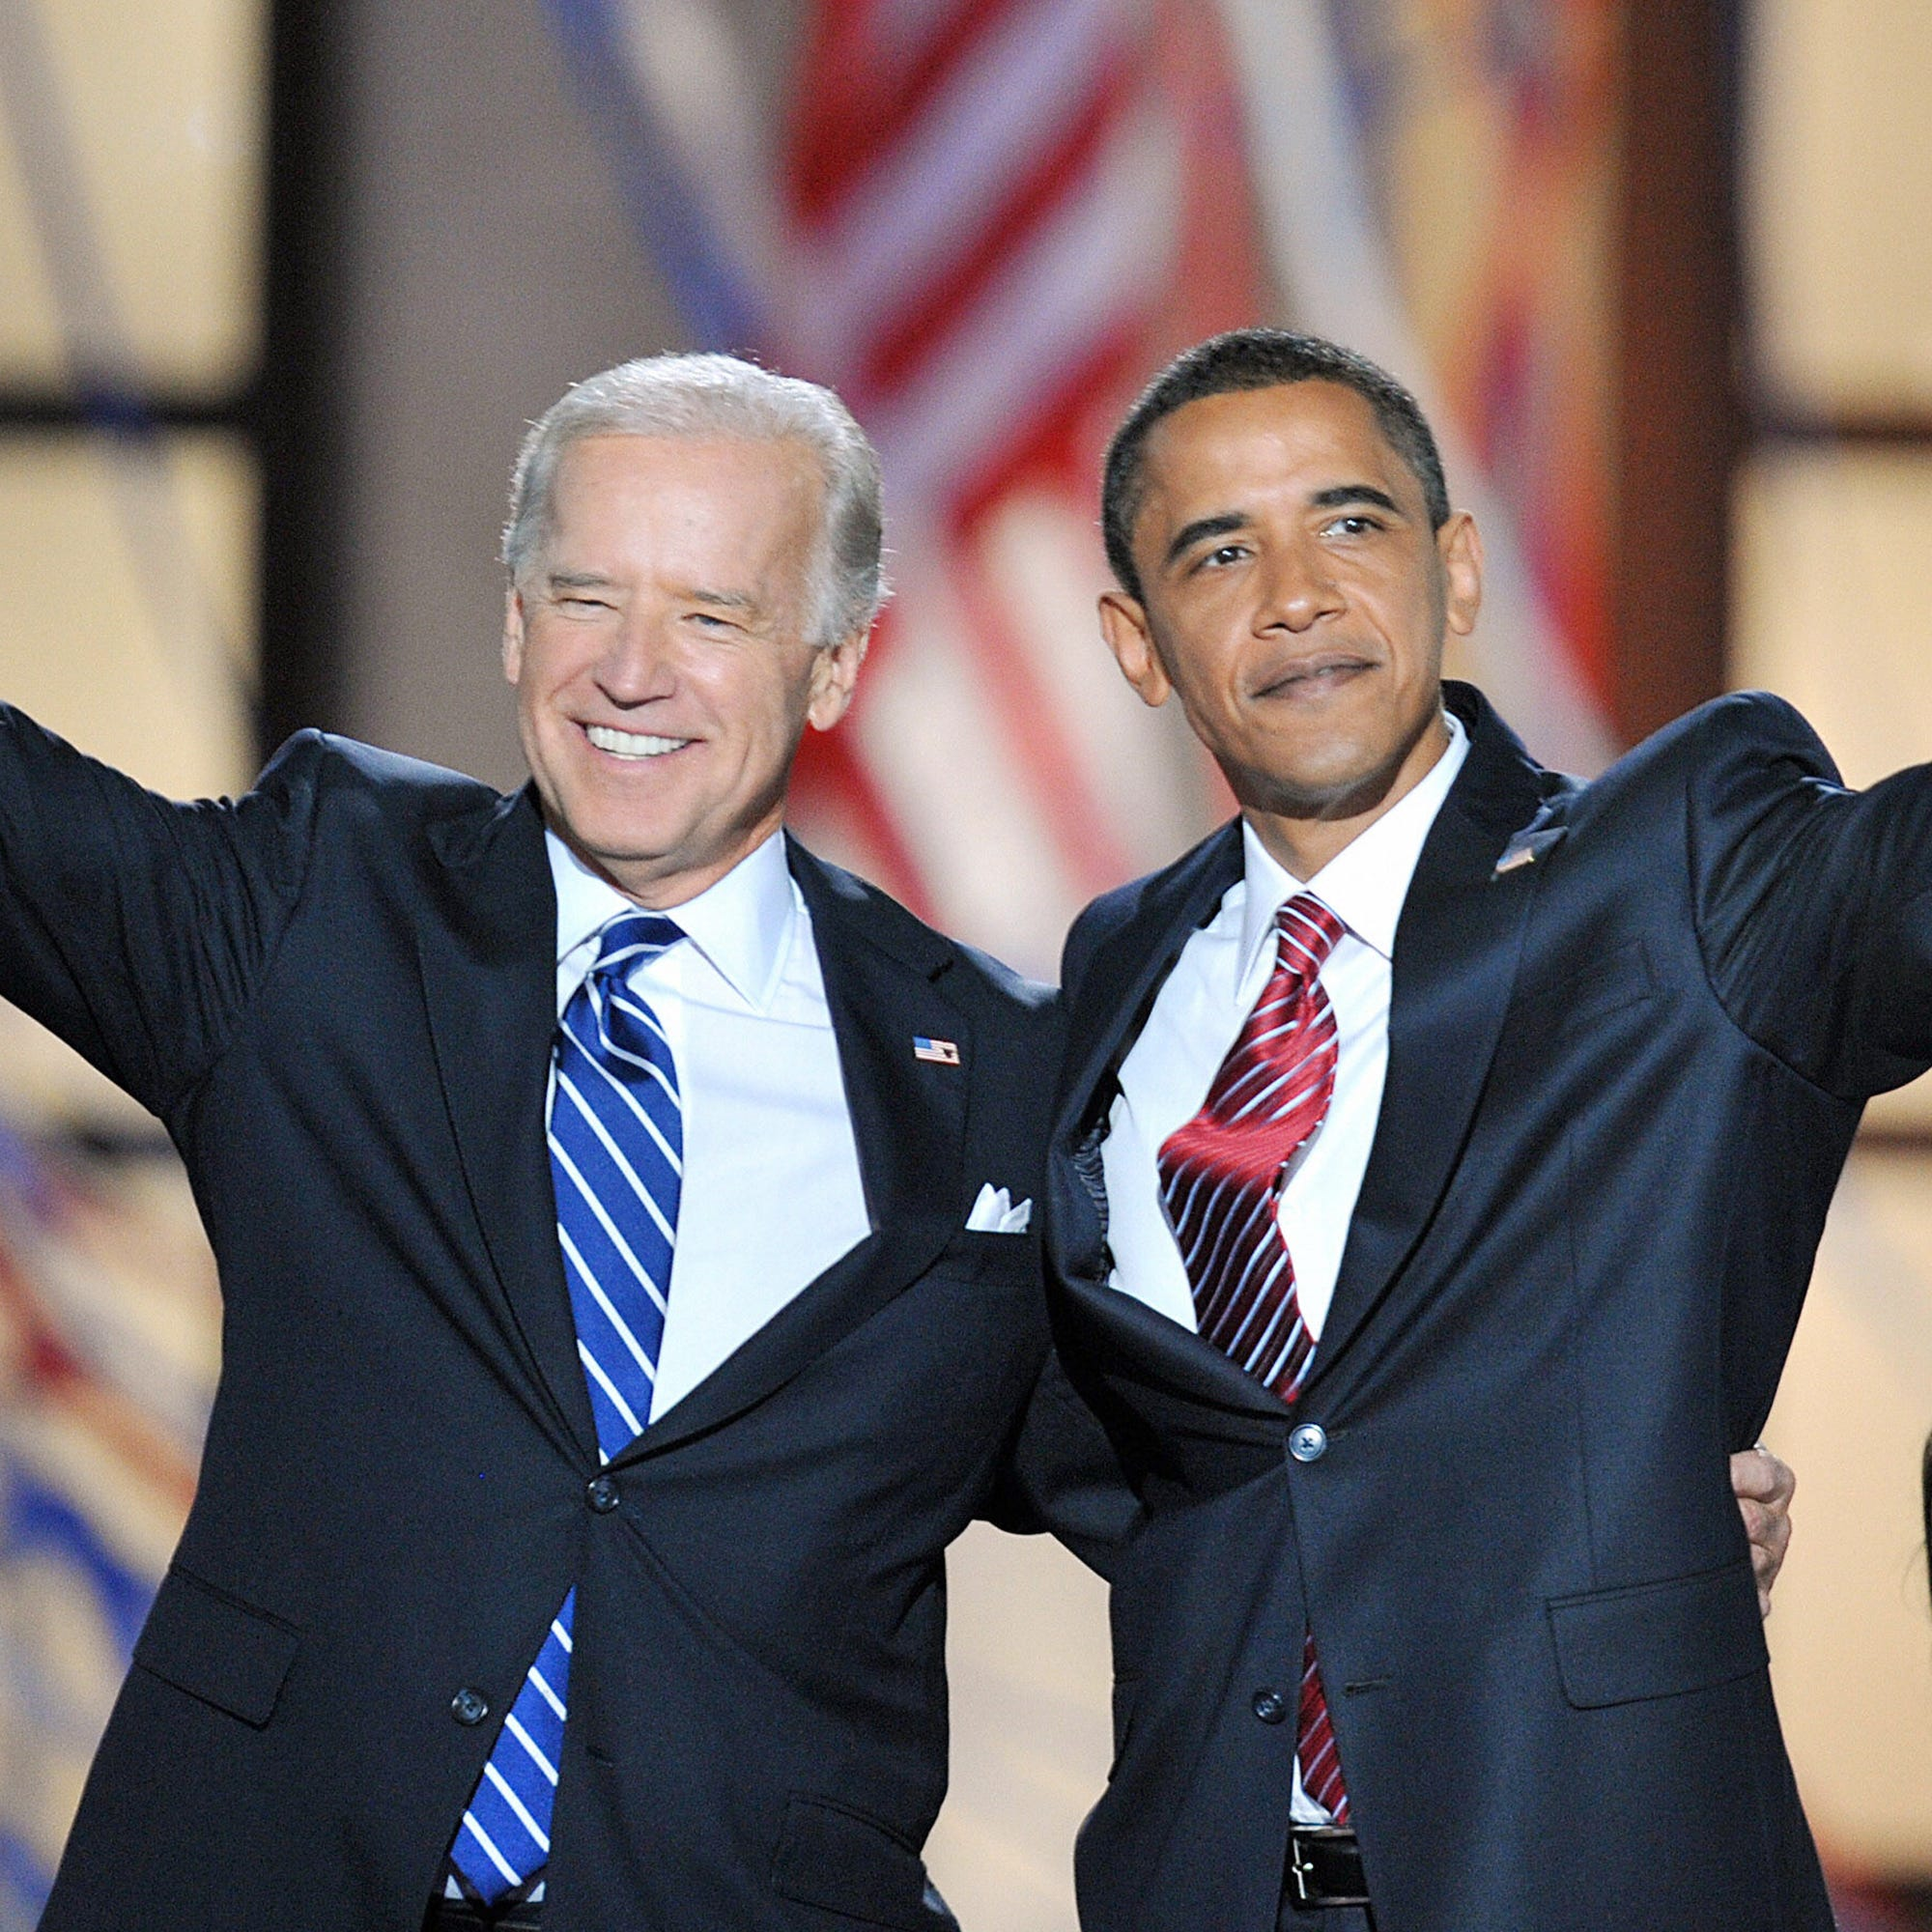 Joe Biden Wedding Ring Image Imagemag Co